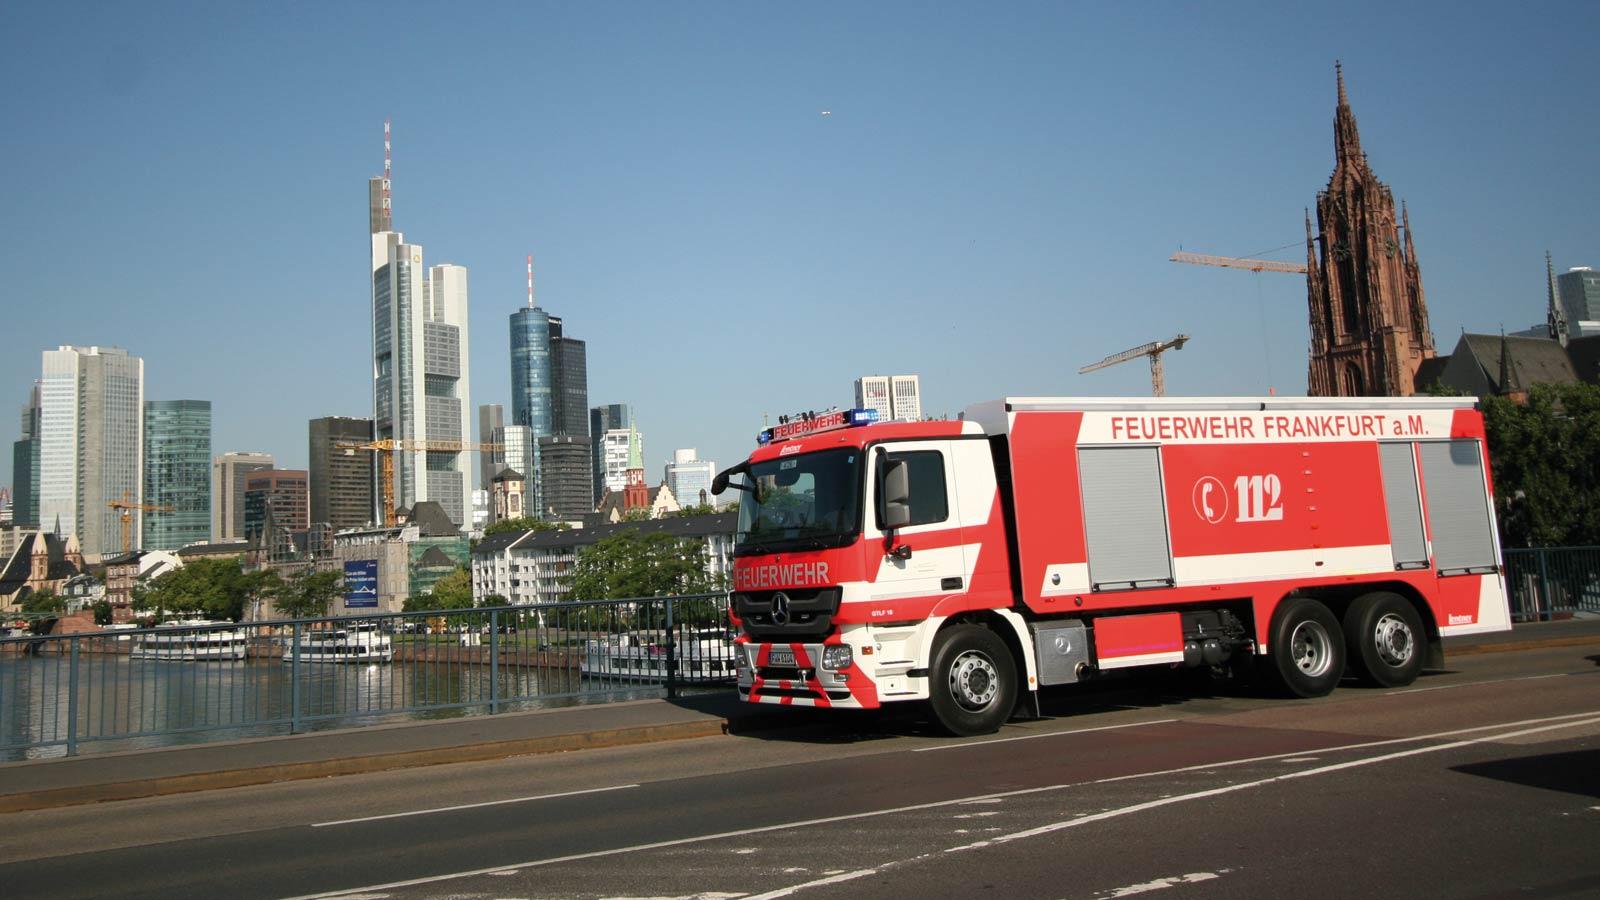 MPT_Kennenlernen_Frankfurt_Commerzbank_Maintower_PIA_Stadt_Frankfurt ...